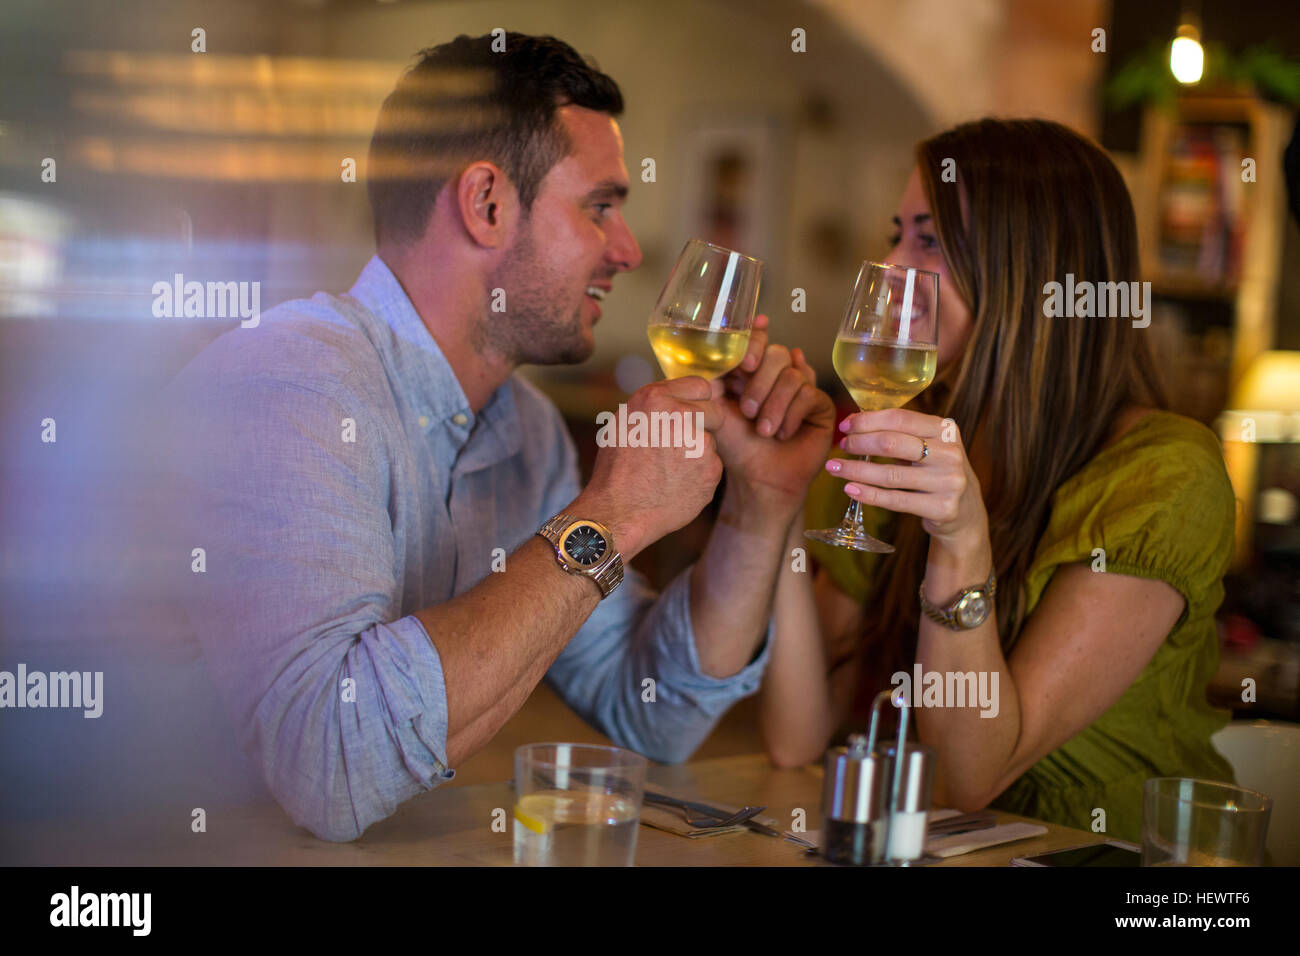 Couple toasting wine in restaurant - Stock Image